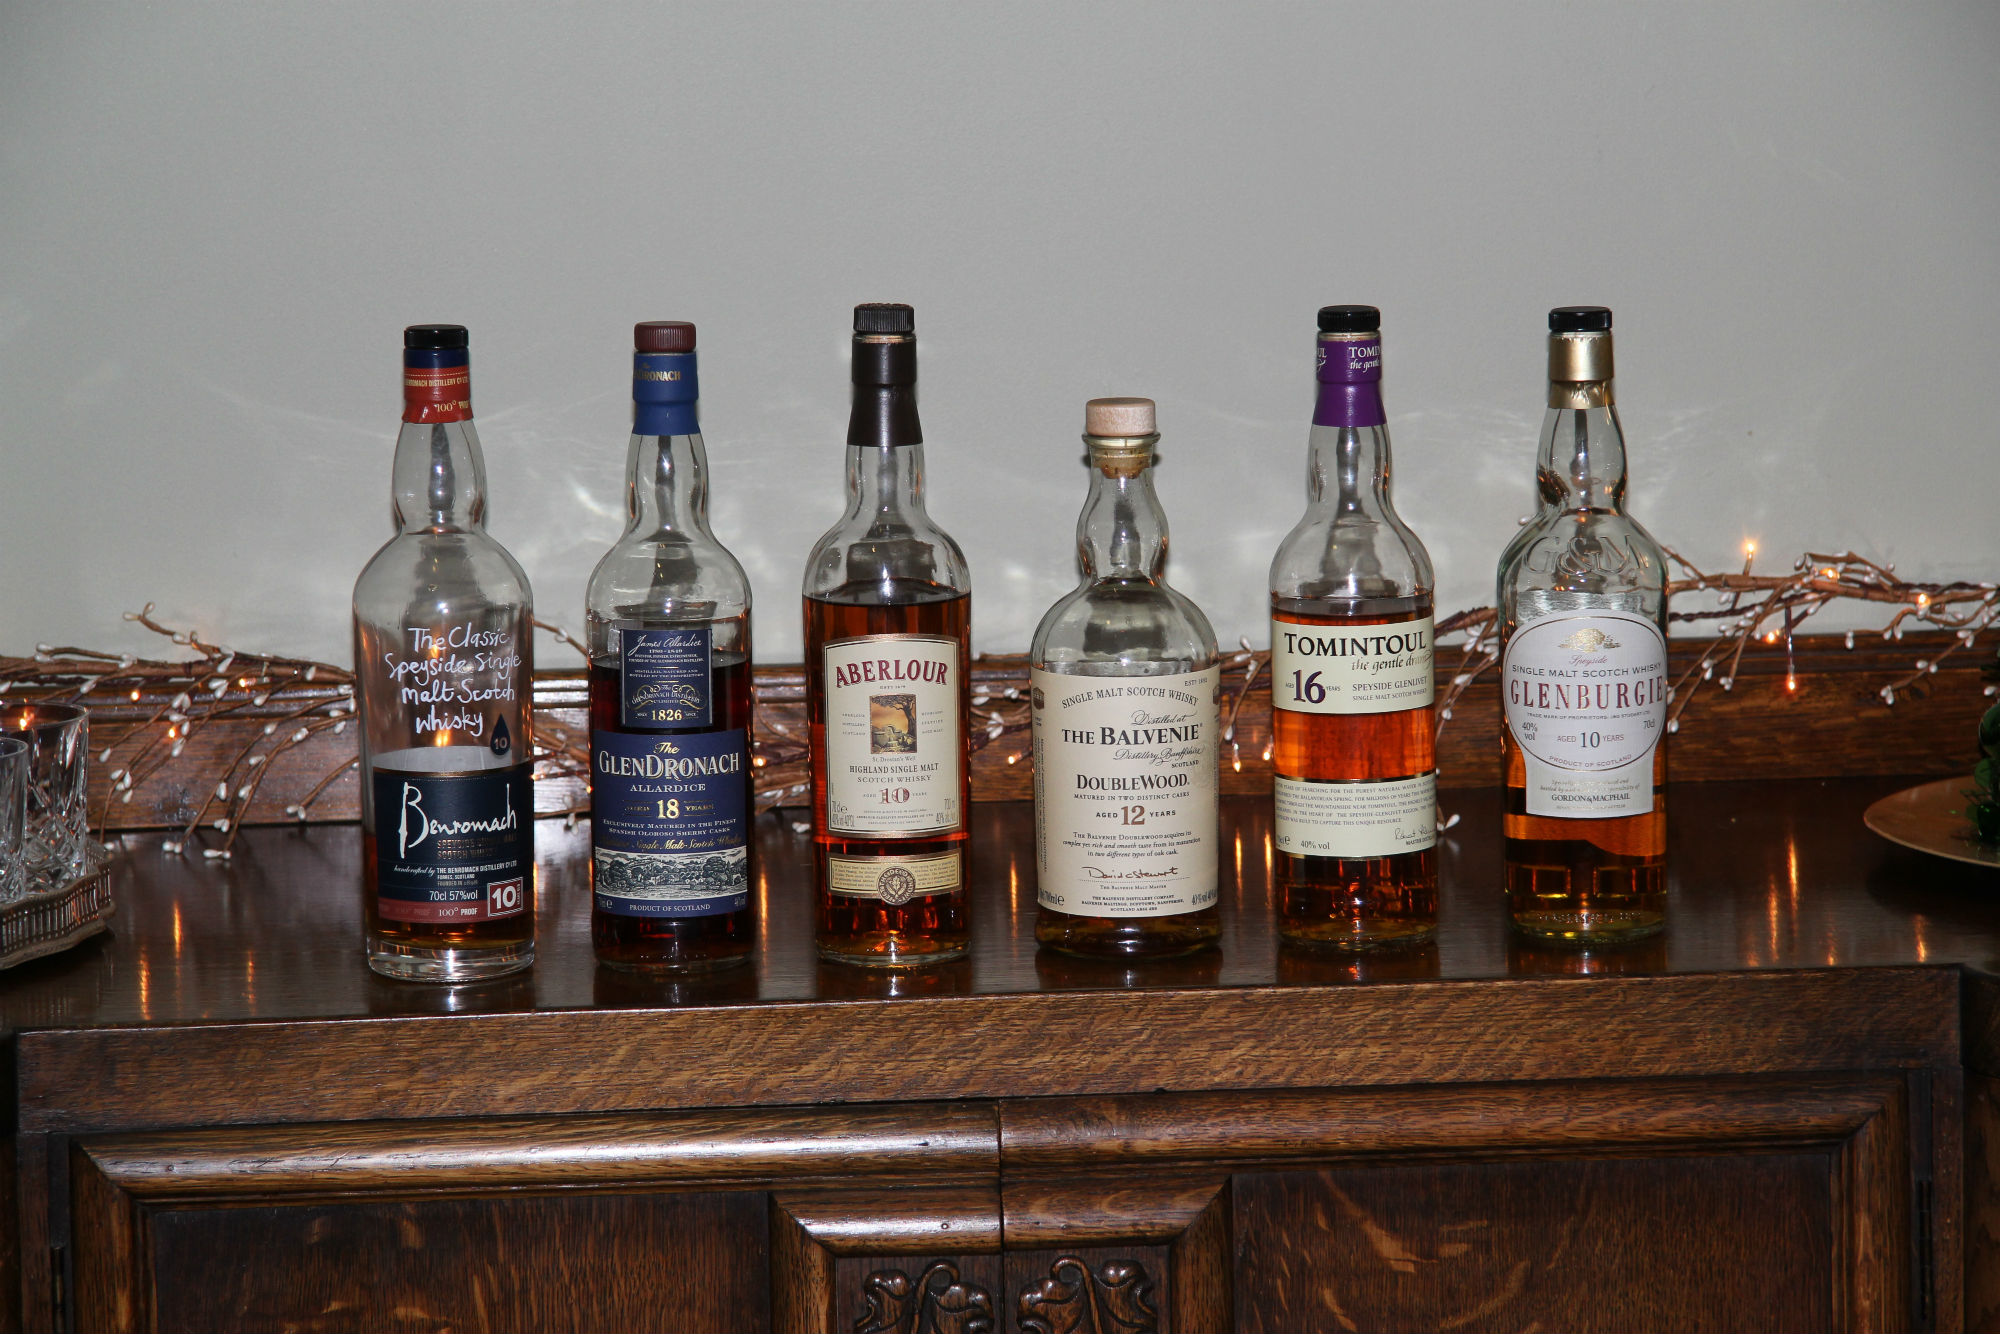 Some local Malt Whiskies